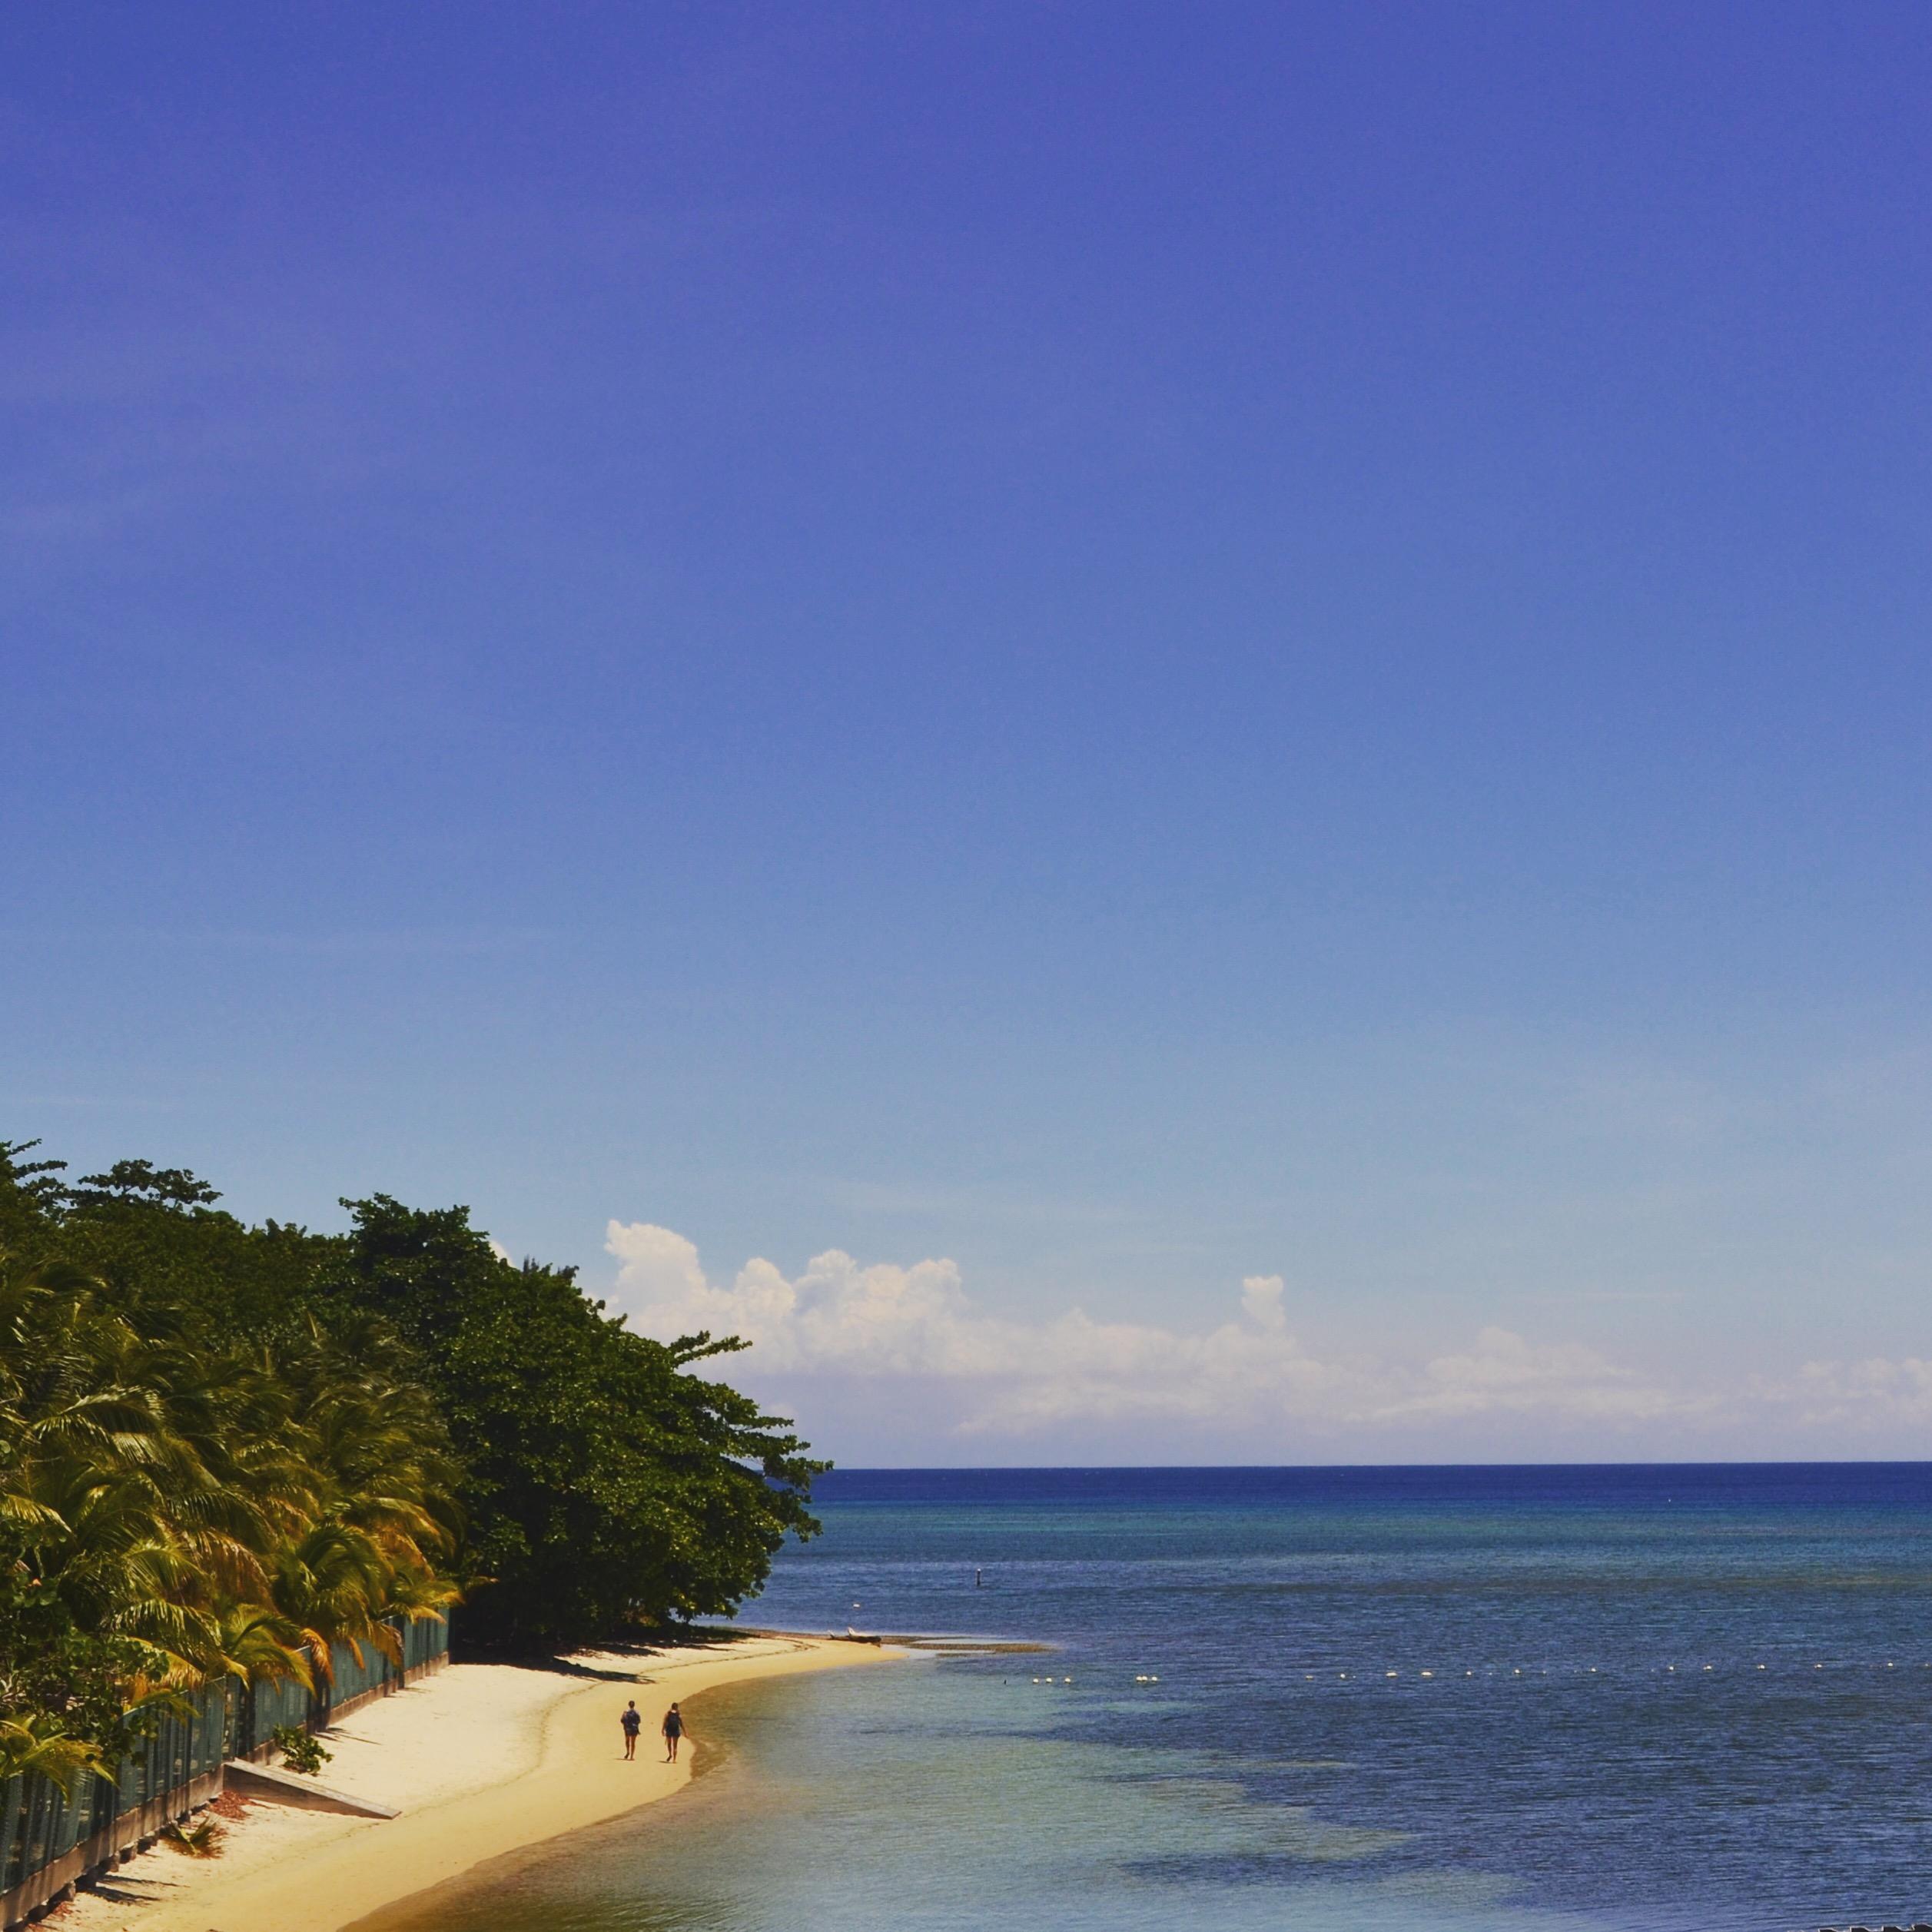 image of beach in Roatán